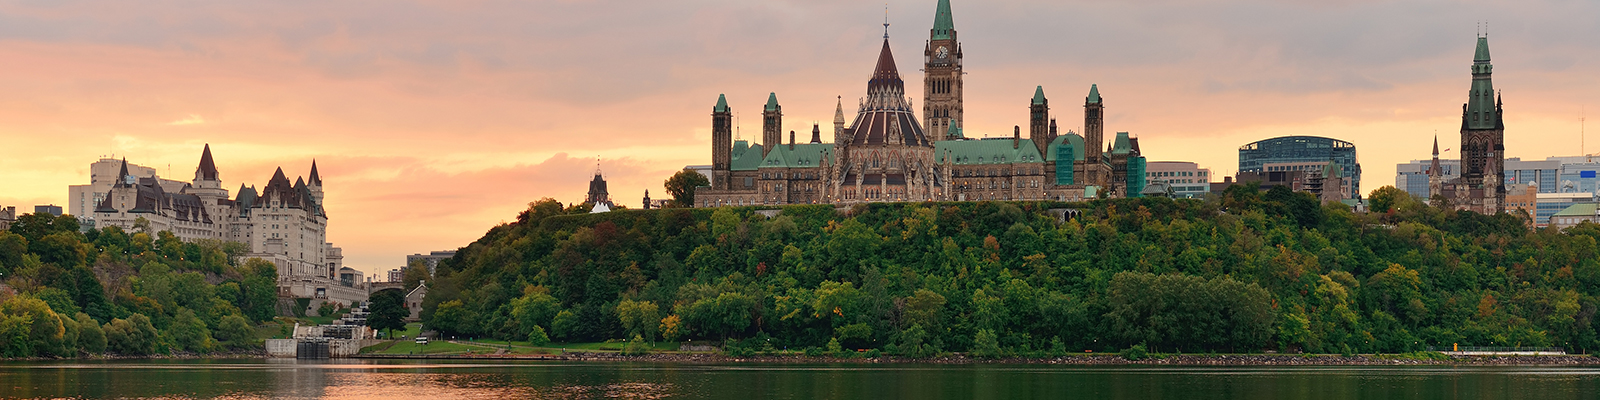 Ottawa, Ontario, Canada | Levée du Soleil